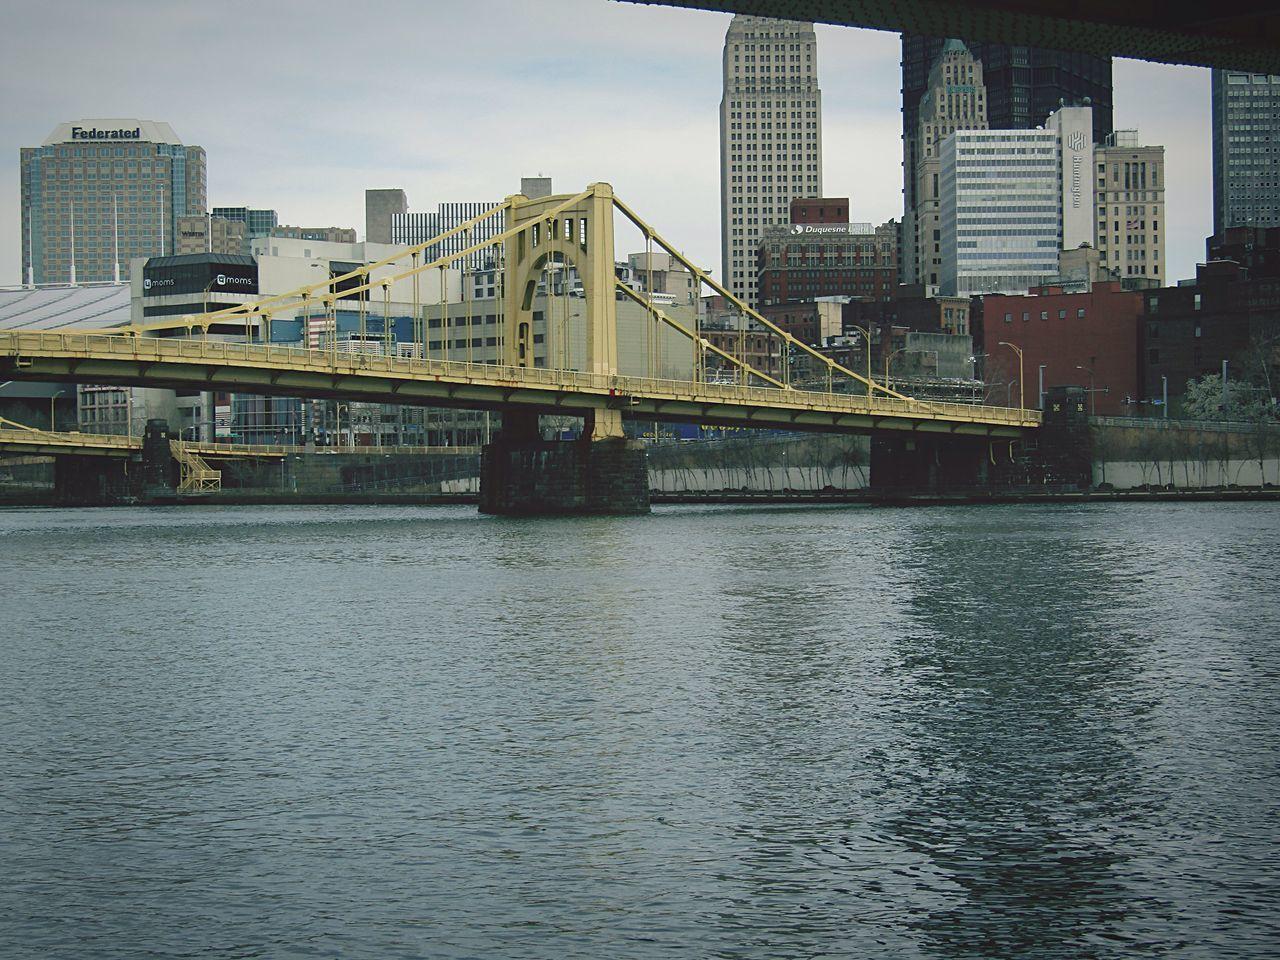 Andy Warhol Bridge Showcase April Pittsburgh Bridge River City Allegheny River